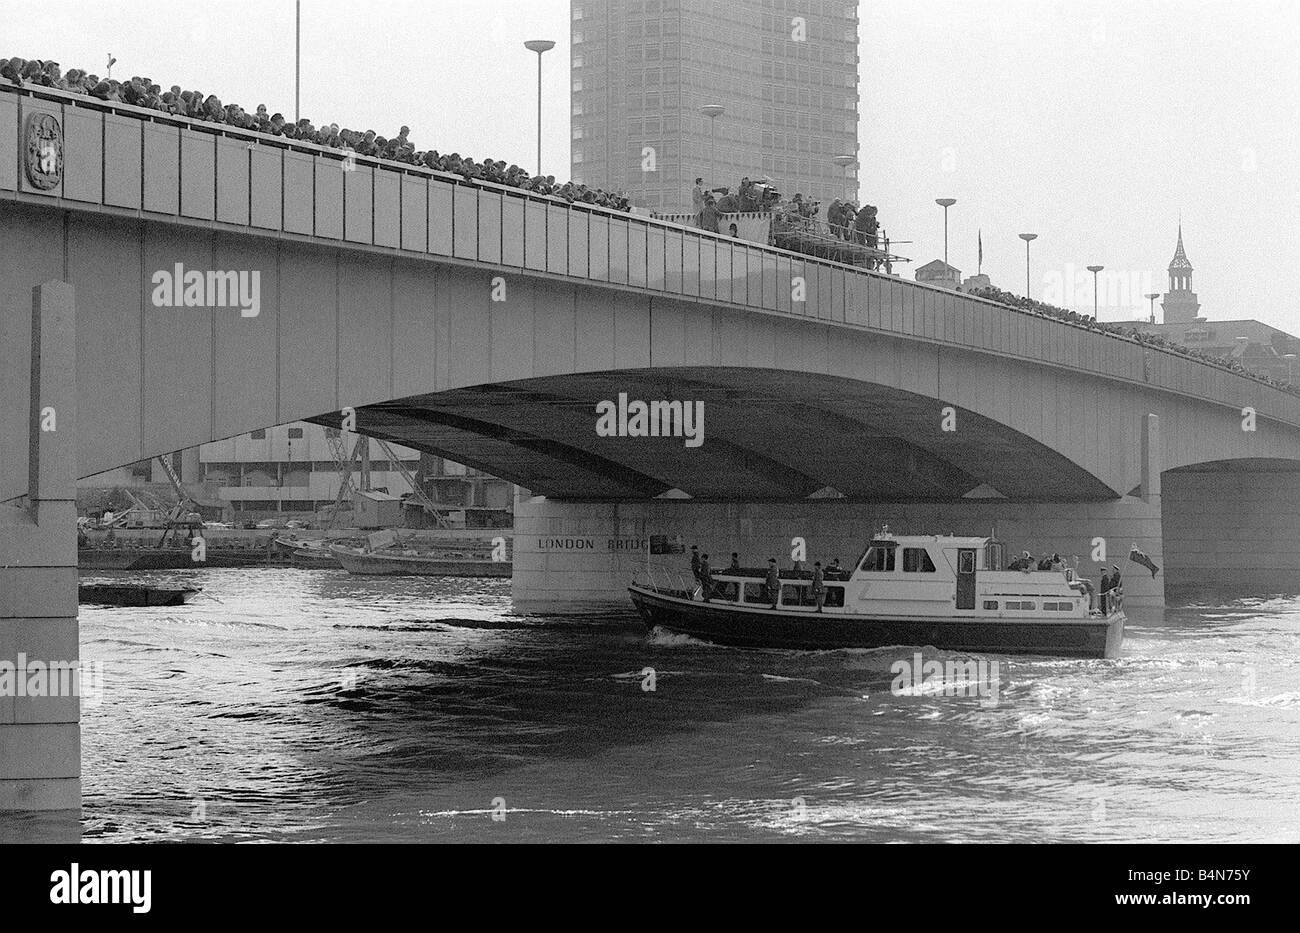 Queen Elizabeth II March 1973 Opens new London Bridge Here the Queen s boat leaves Fishmongers Quay - Stock Image